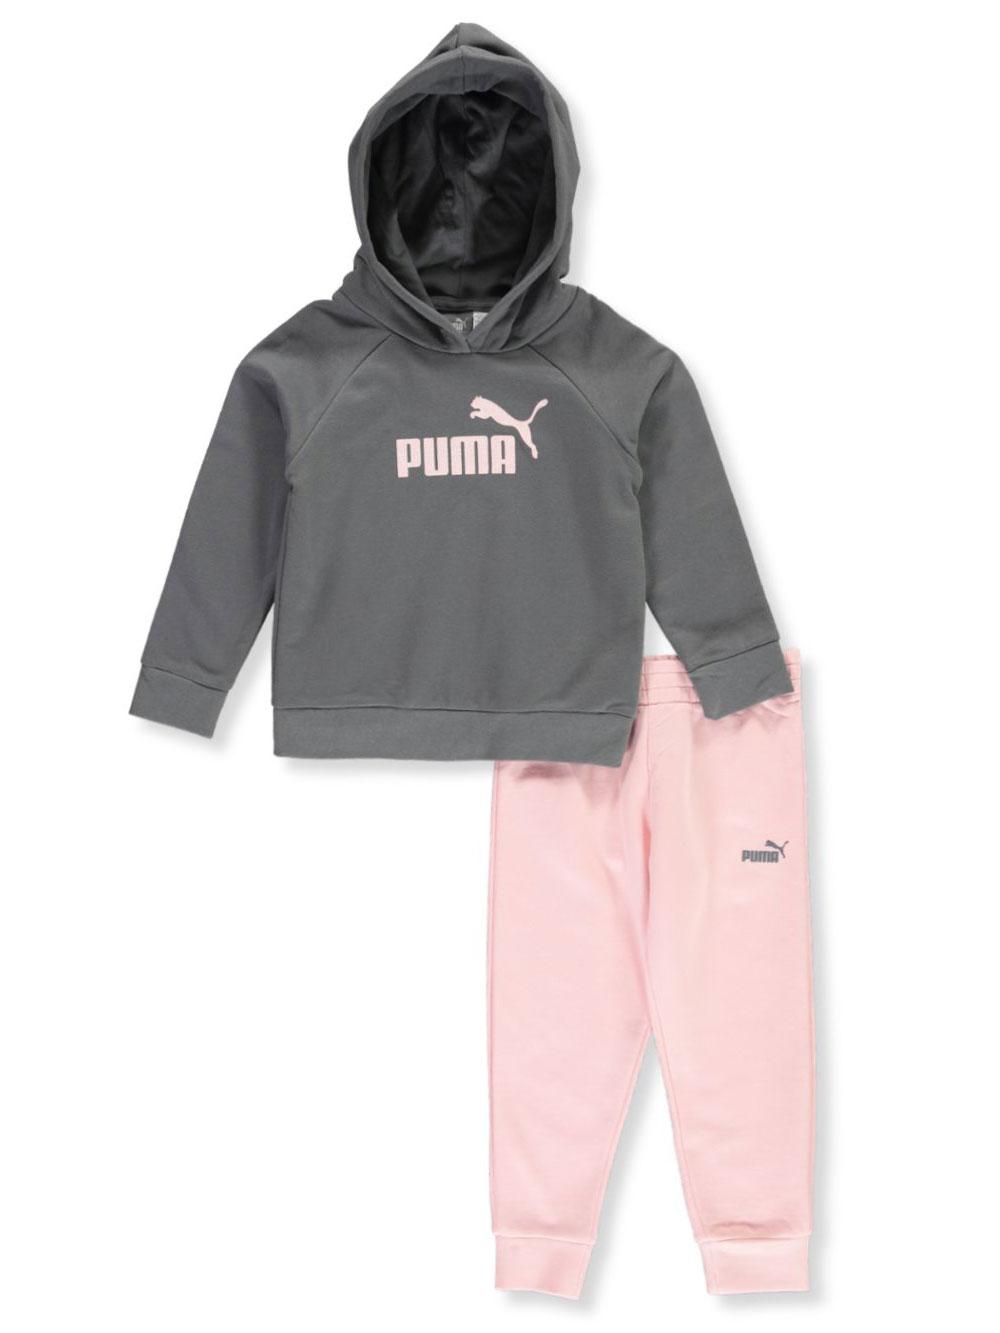 69db8323afad9 Puma Girls' Raglan Seamed Fleece 2-Piece Sweatsuit Pants Set